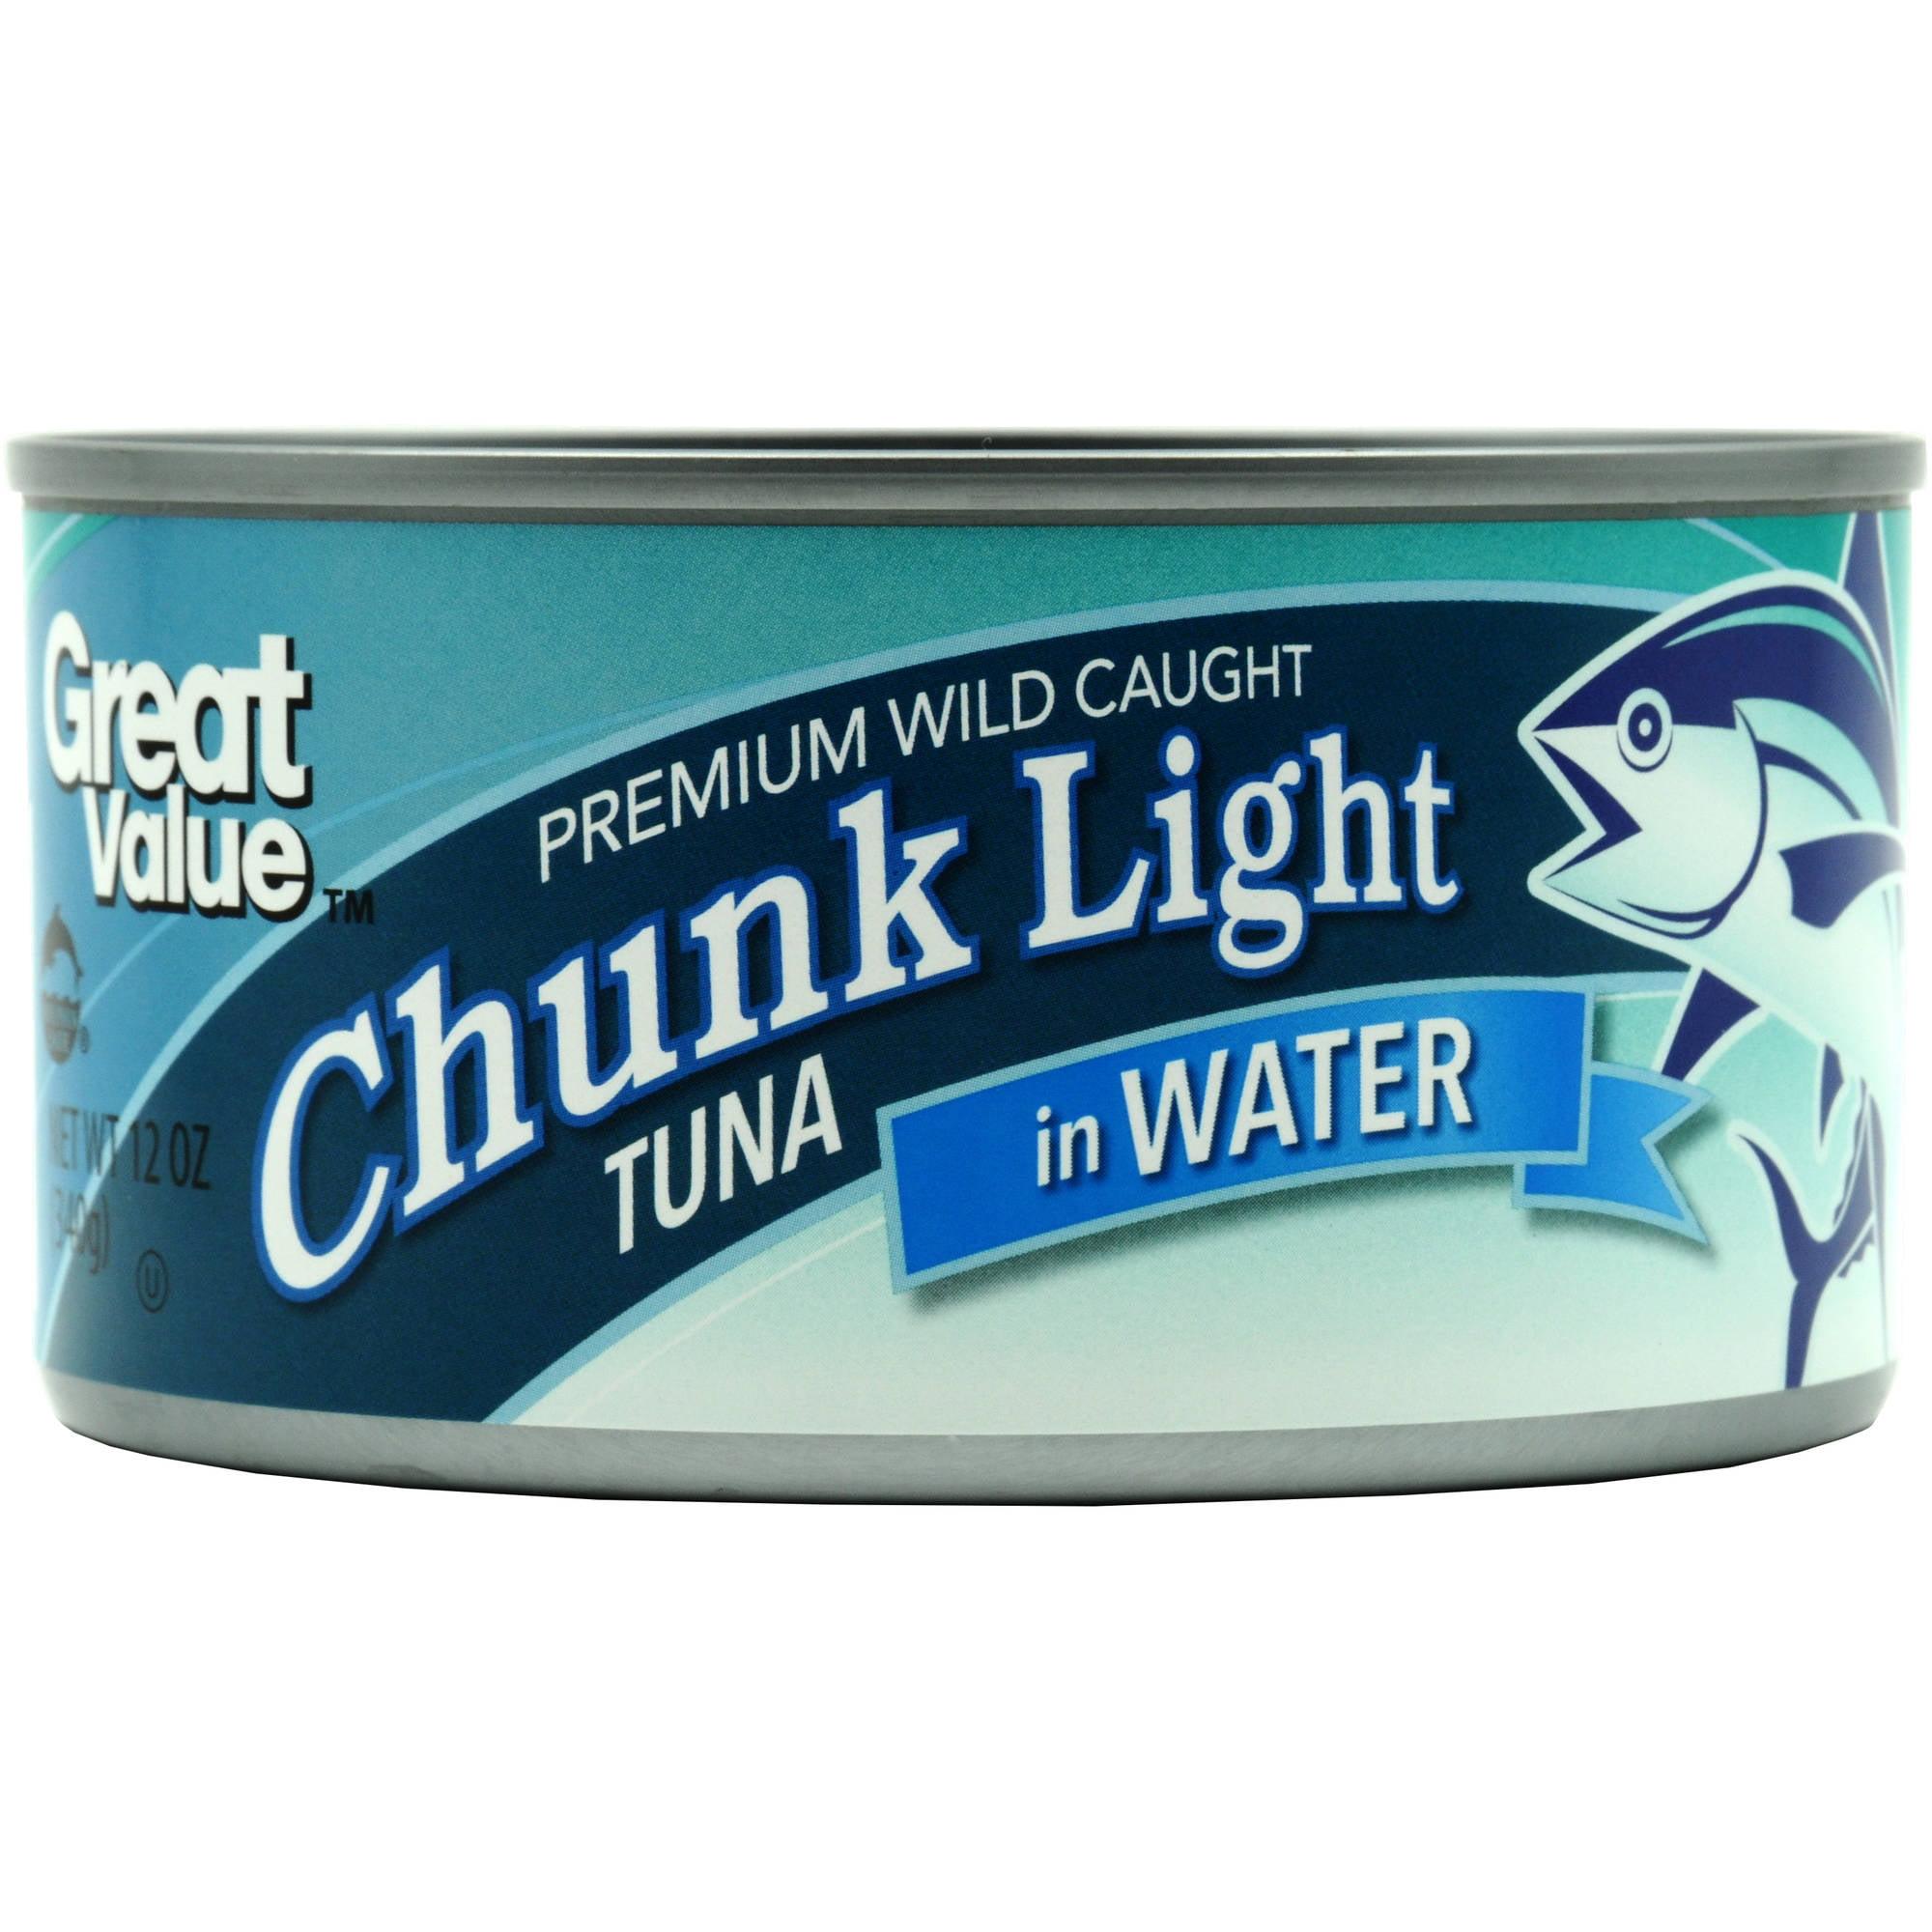 Great Value Chunk Light Tuna In Water, 12 oz